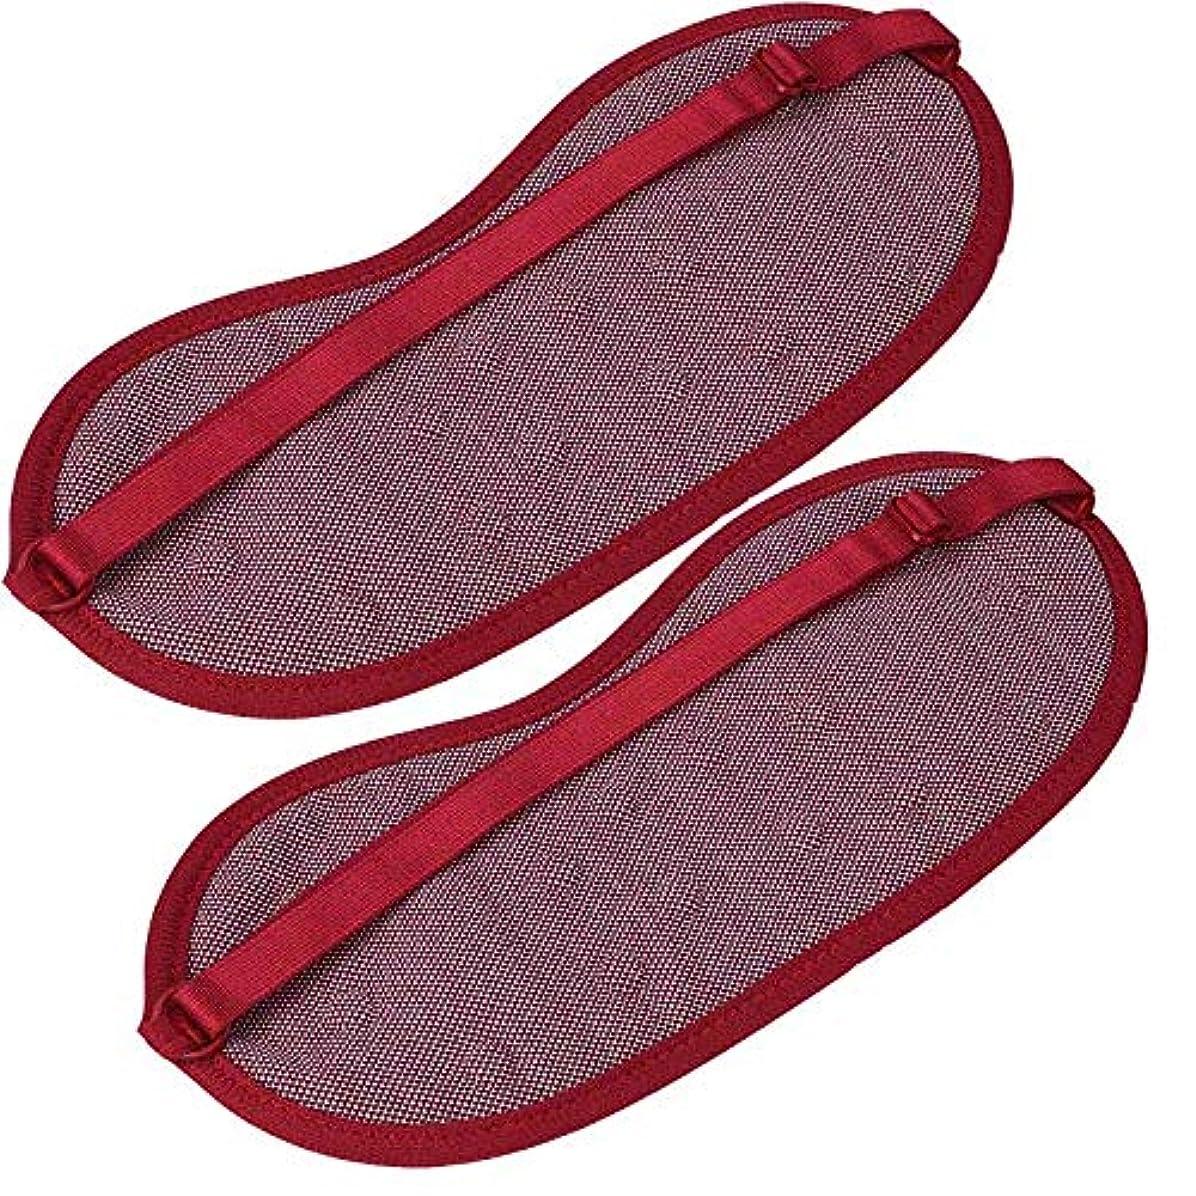 NOTE 2ピースソフトシルクアイパッチスムースマスクカバー遠赤外線マッサージ療法睡眠マスクシェード旅行残りアイシェード睡眠包帯